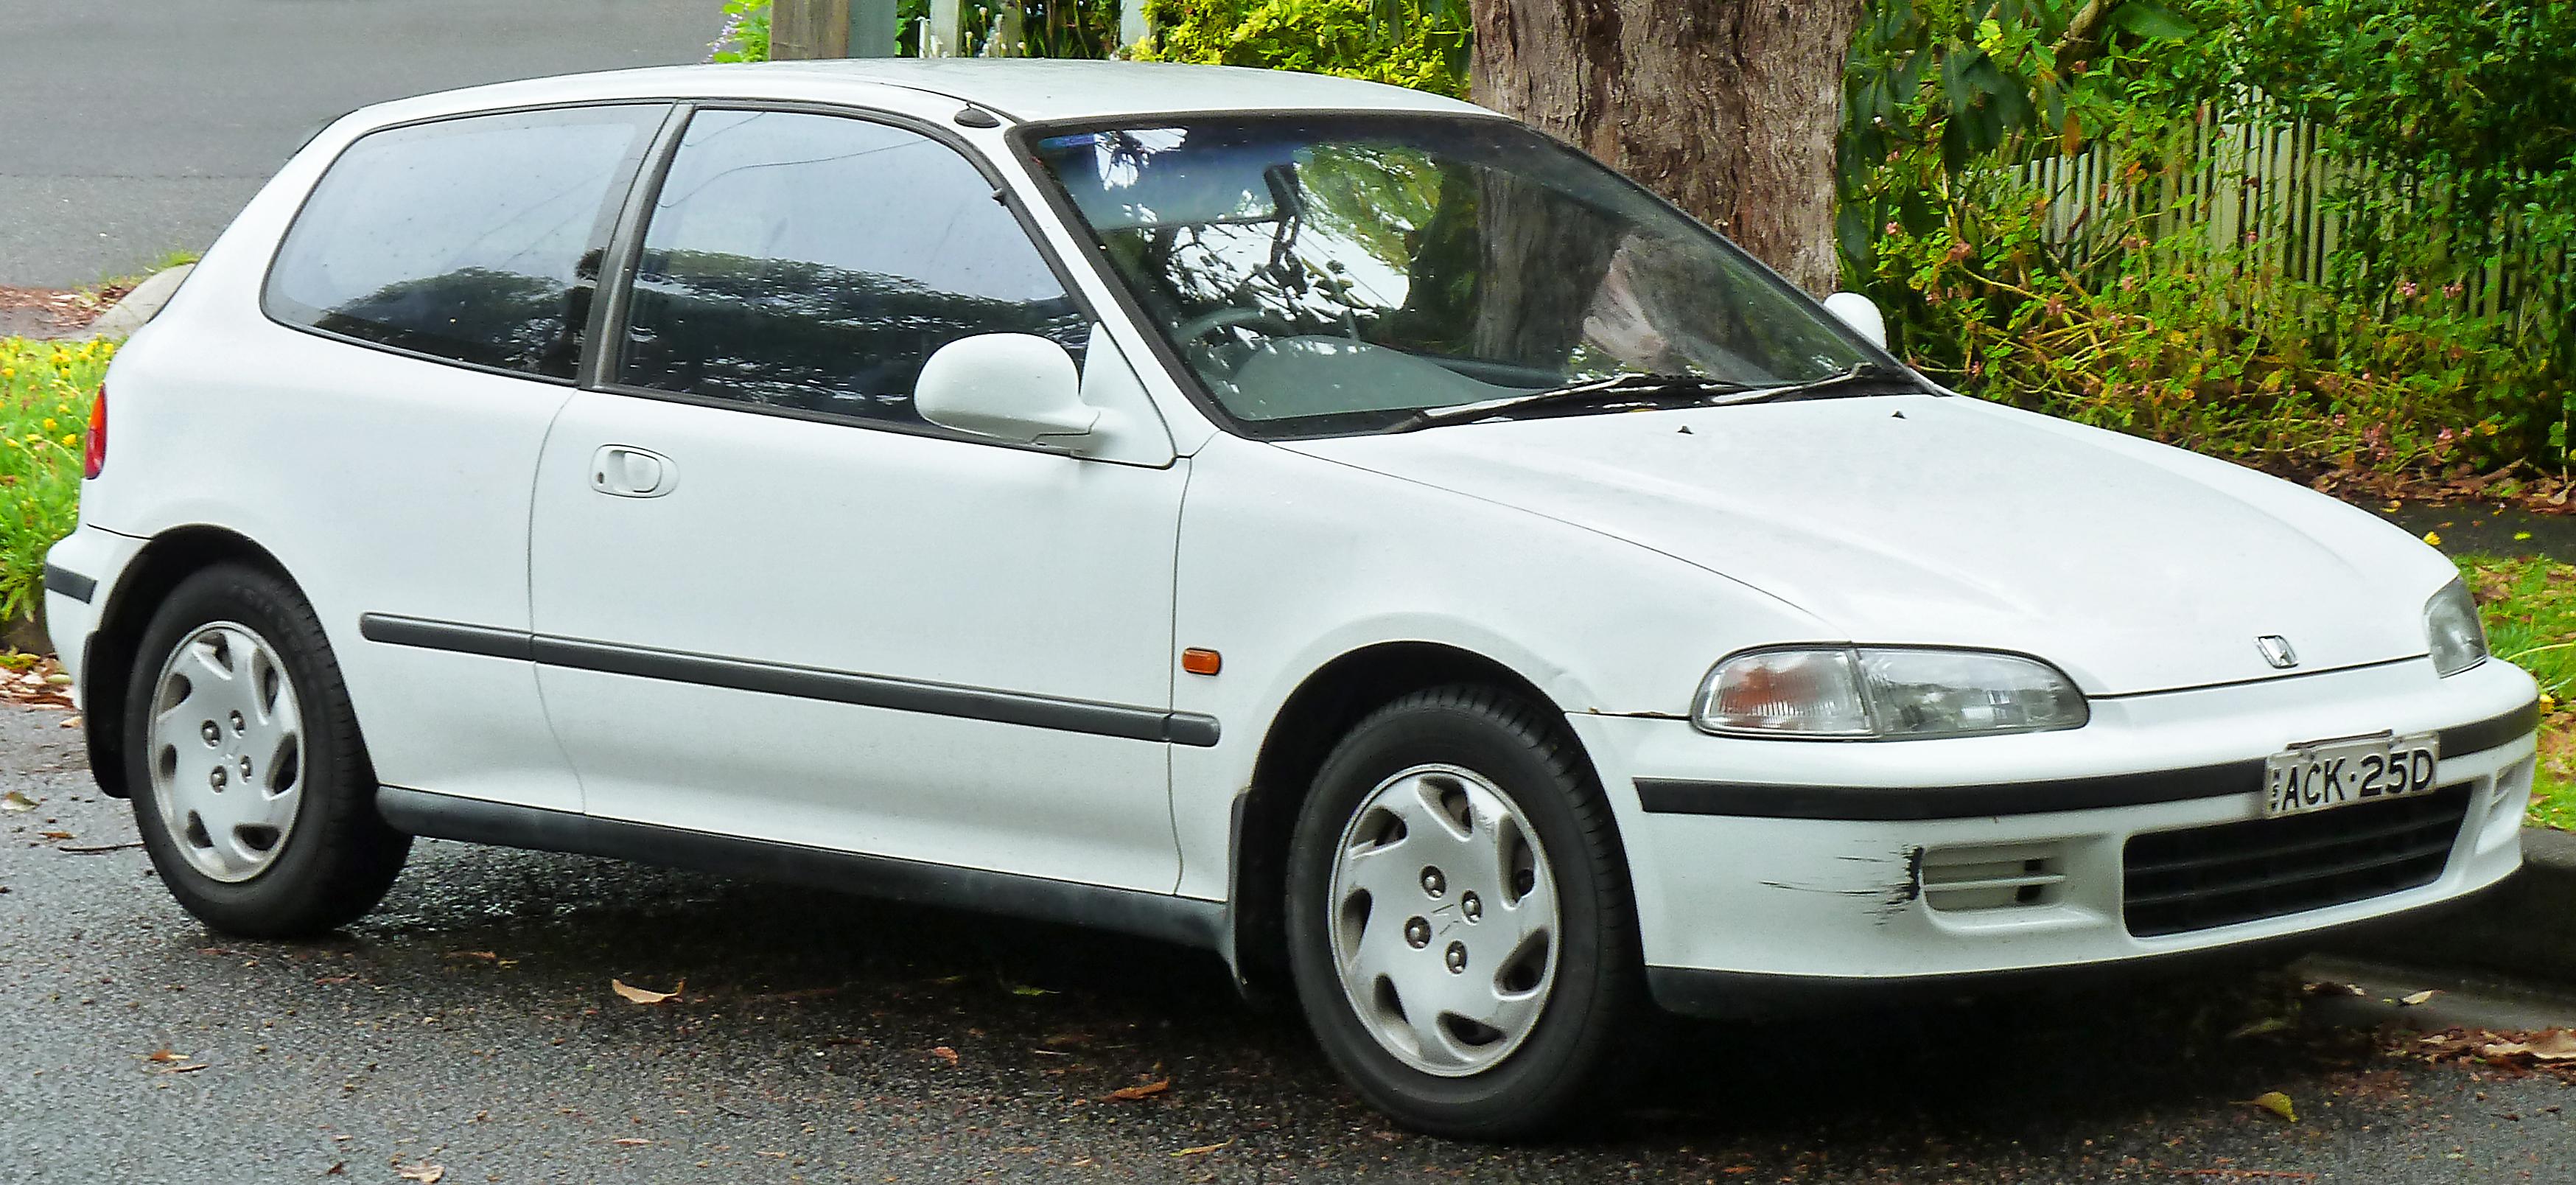 File 1993 1995 Honda Civic Gli 3 Door Hatchback 2011 11